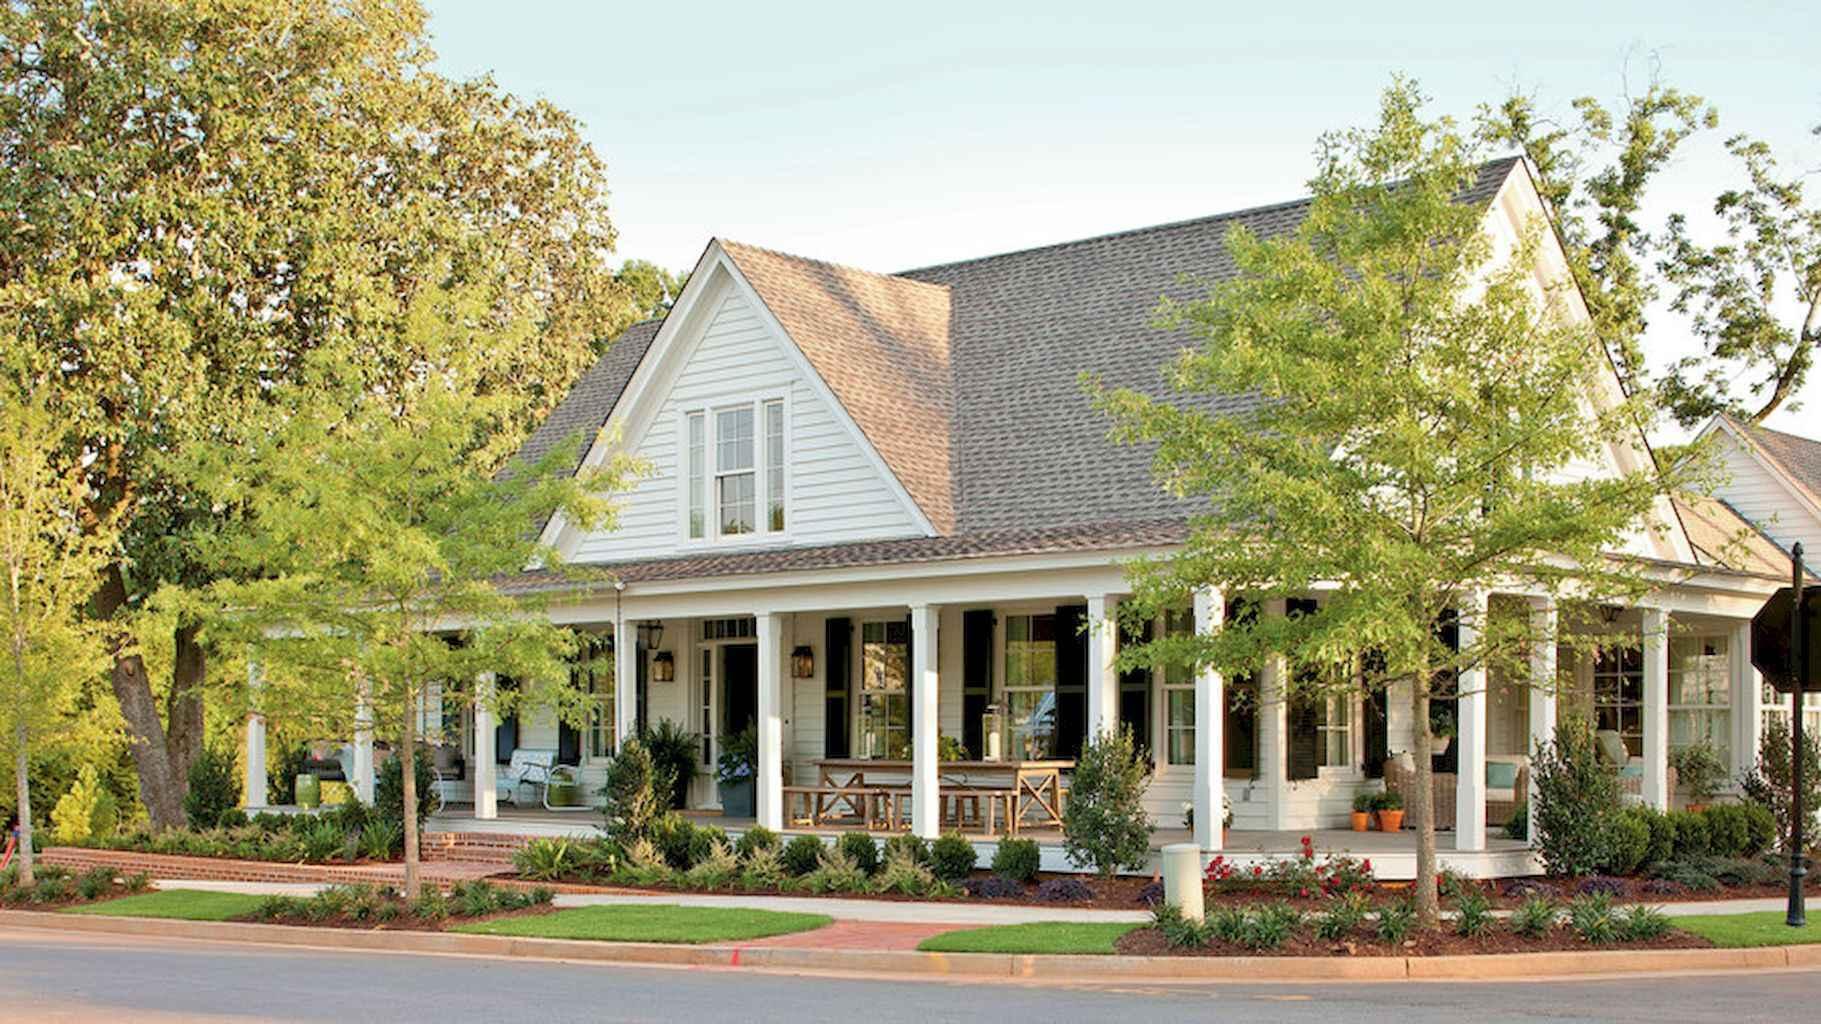 60 amazing farmhouse plans cracker style design ideas (9)